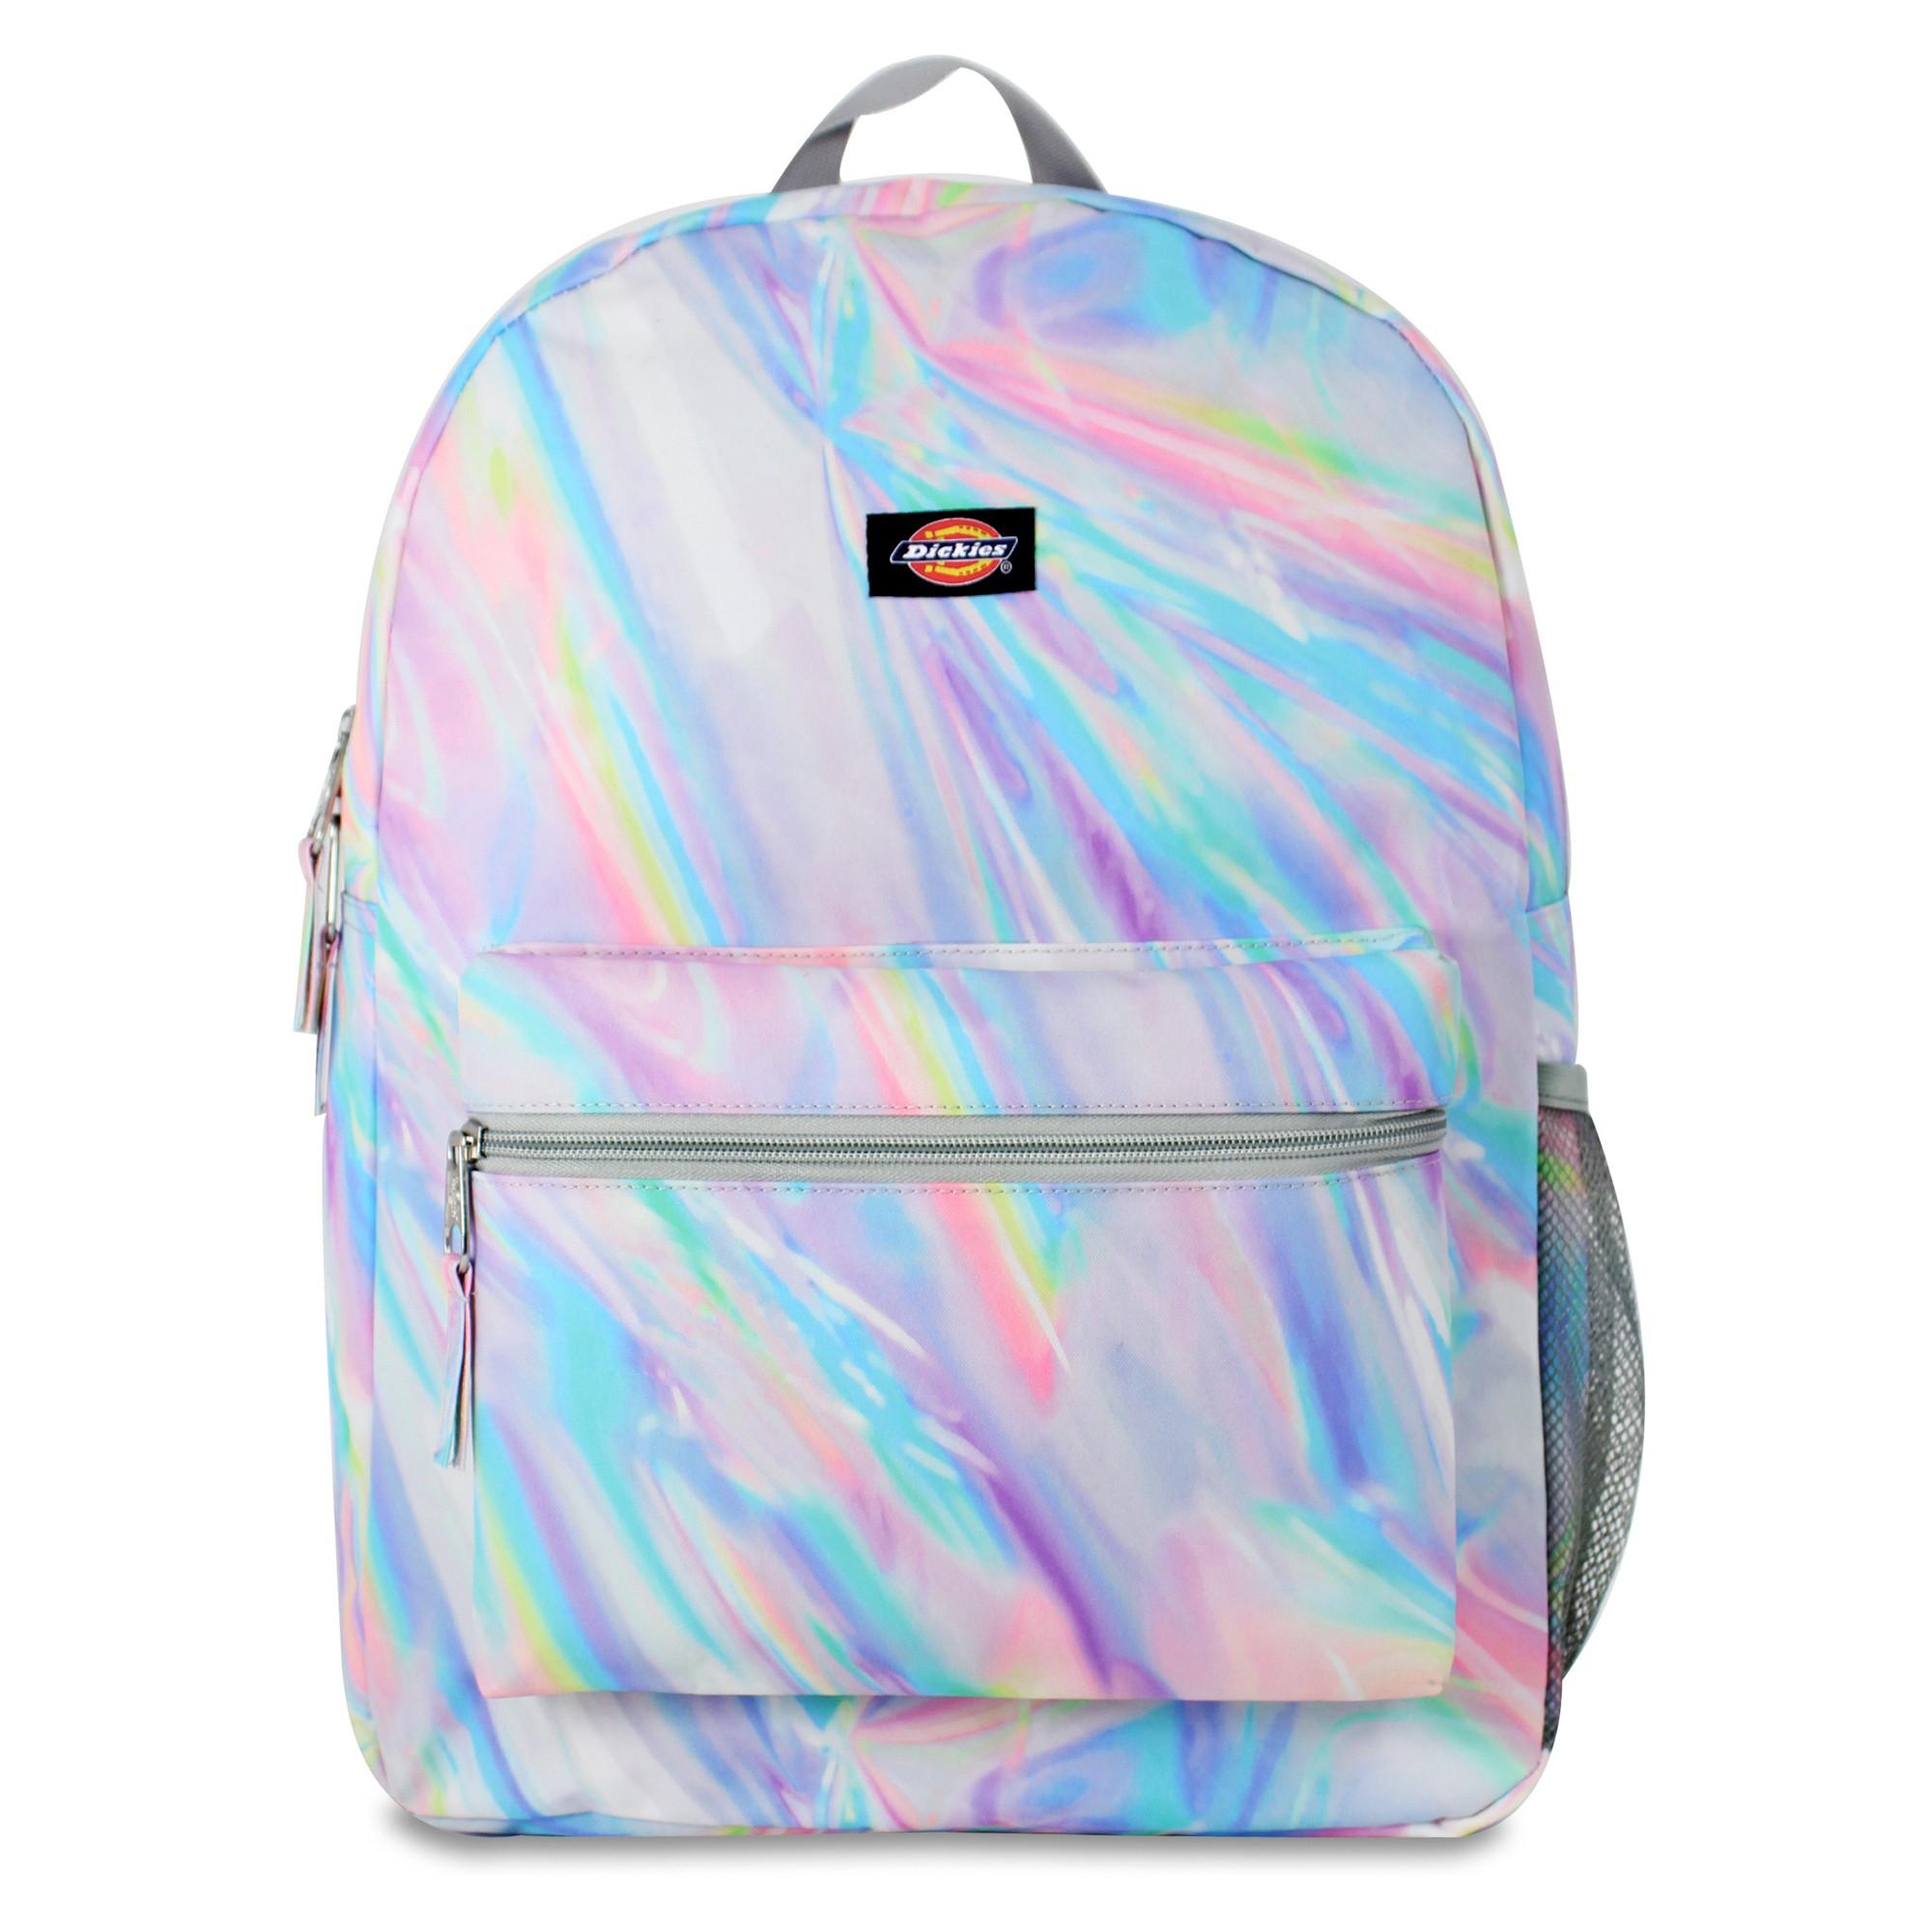 b1dd9b8360 Dickies Student Backpack - Iridescent